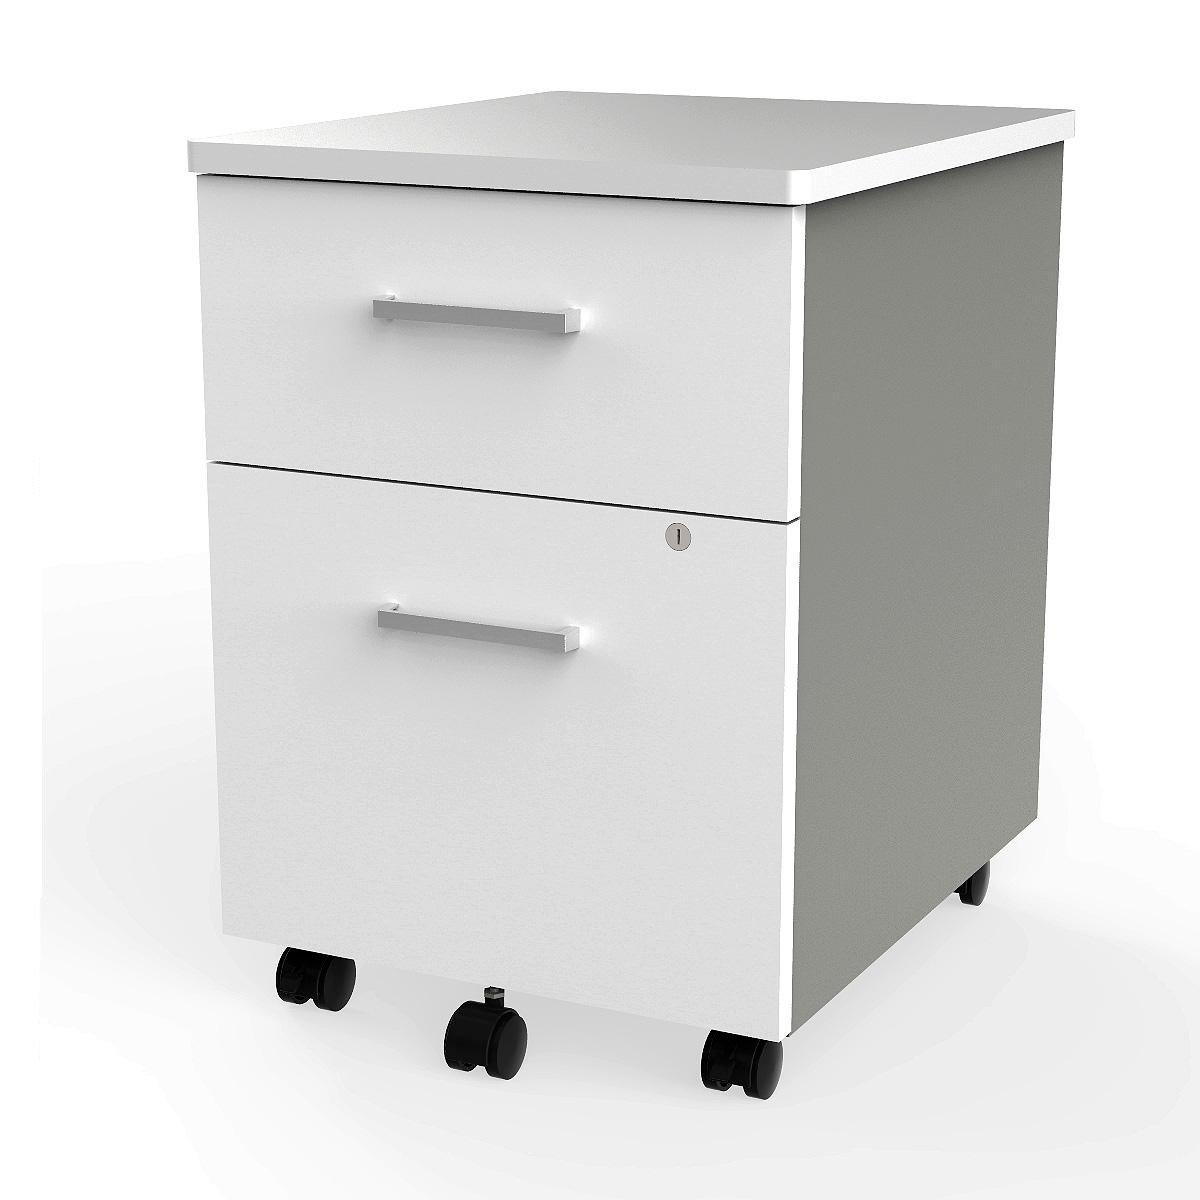 Linea Italia - locking 2 Drawer Metal File Pedestal, Ash, Office File Cabinet on Wheels, Under Desk 24 High, Steel Structural Drawers Under Desk 24 High ZUD106